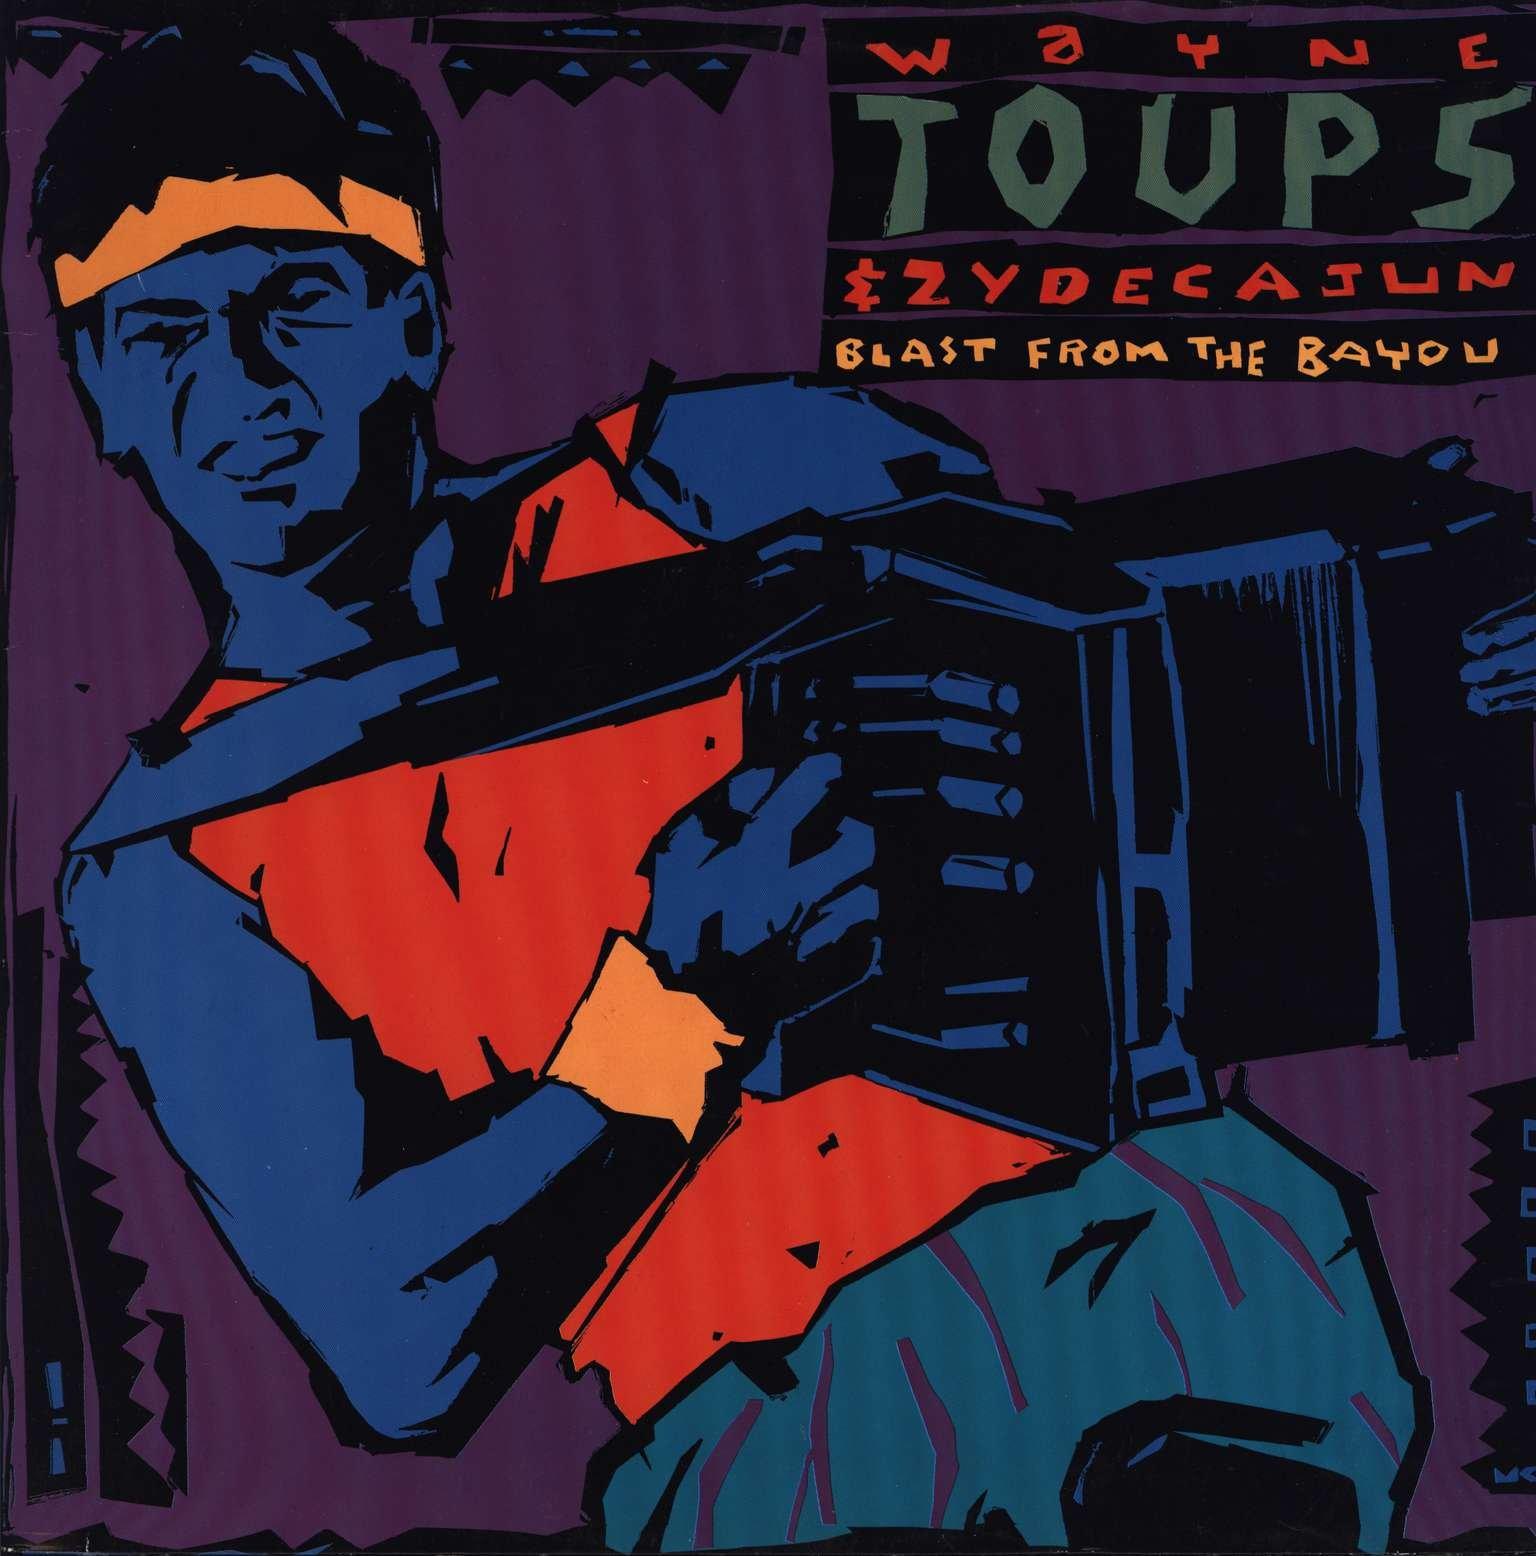 Blast from the Bayou [Vinyl]